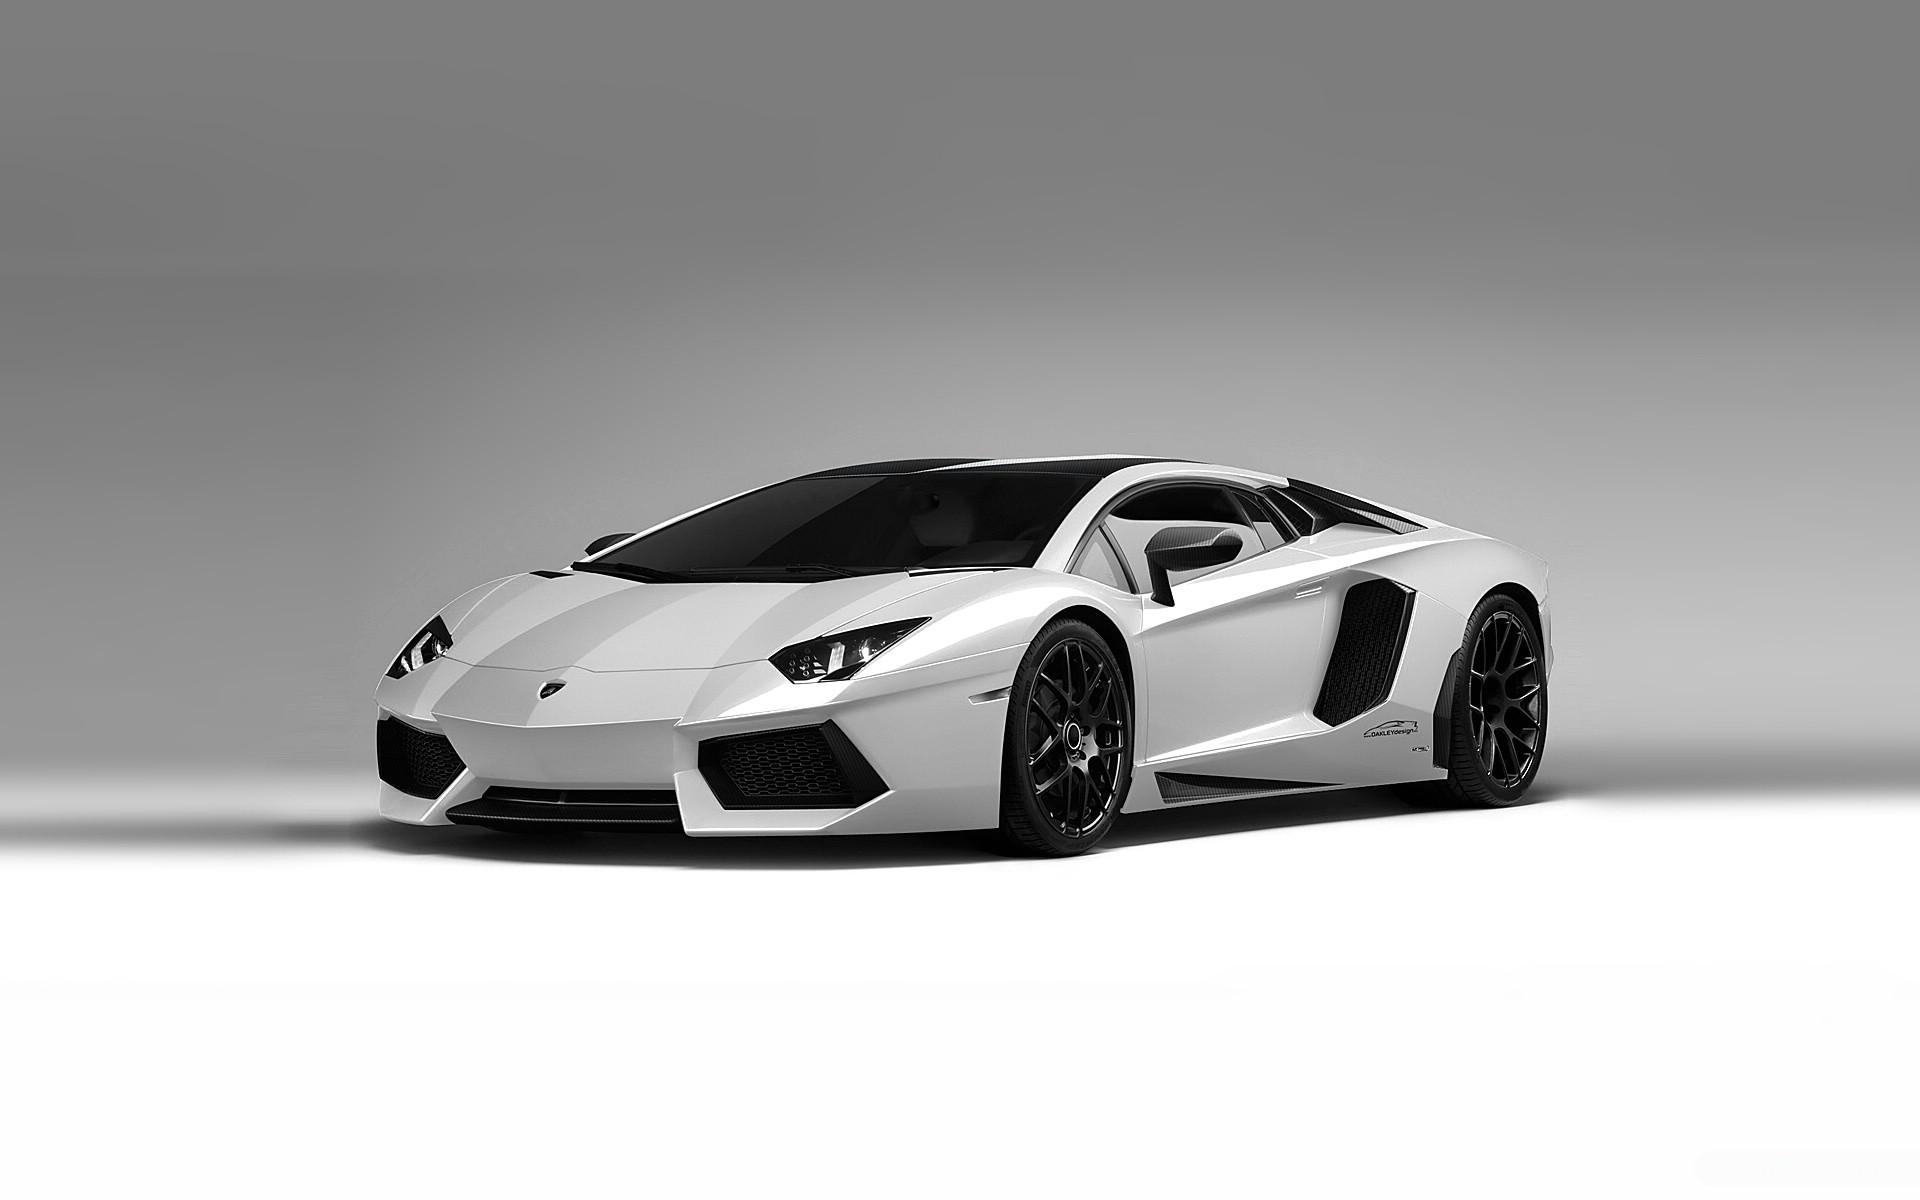 LamborghiniAventador 24 Car Desktop Background